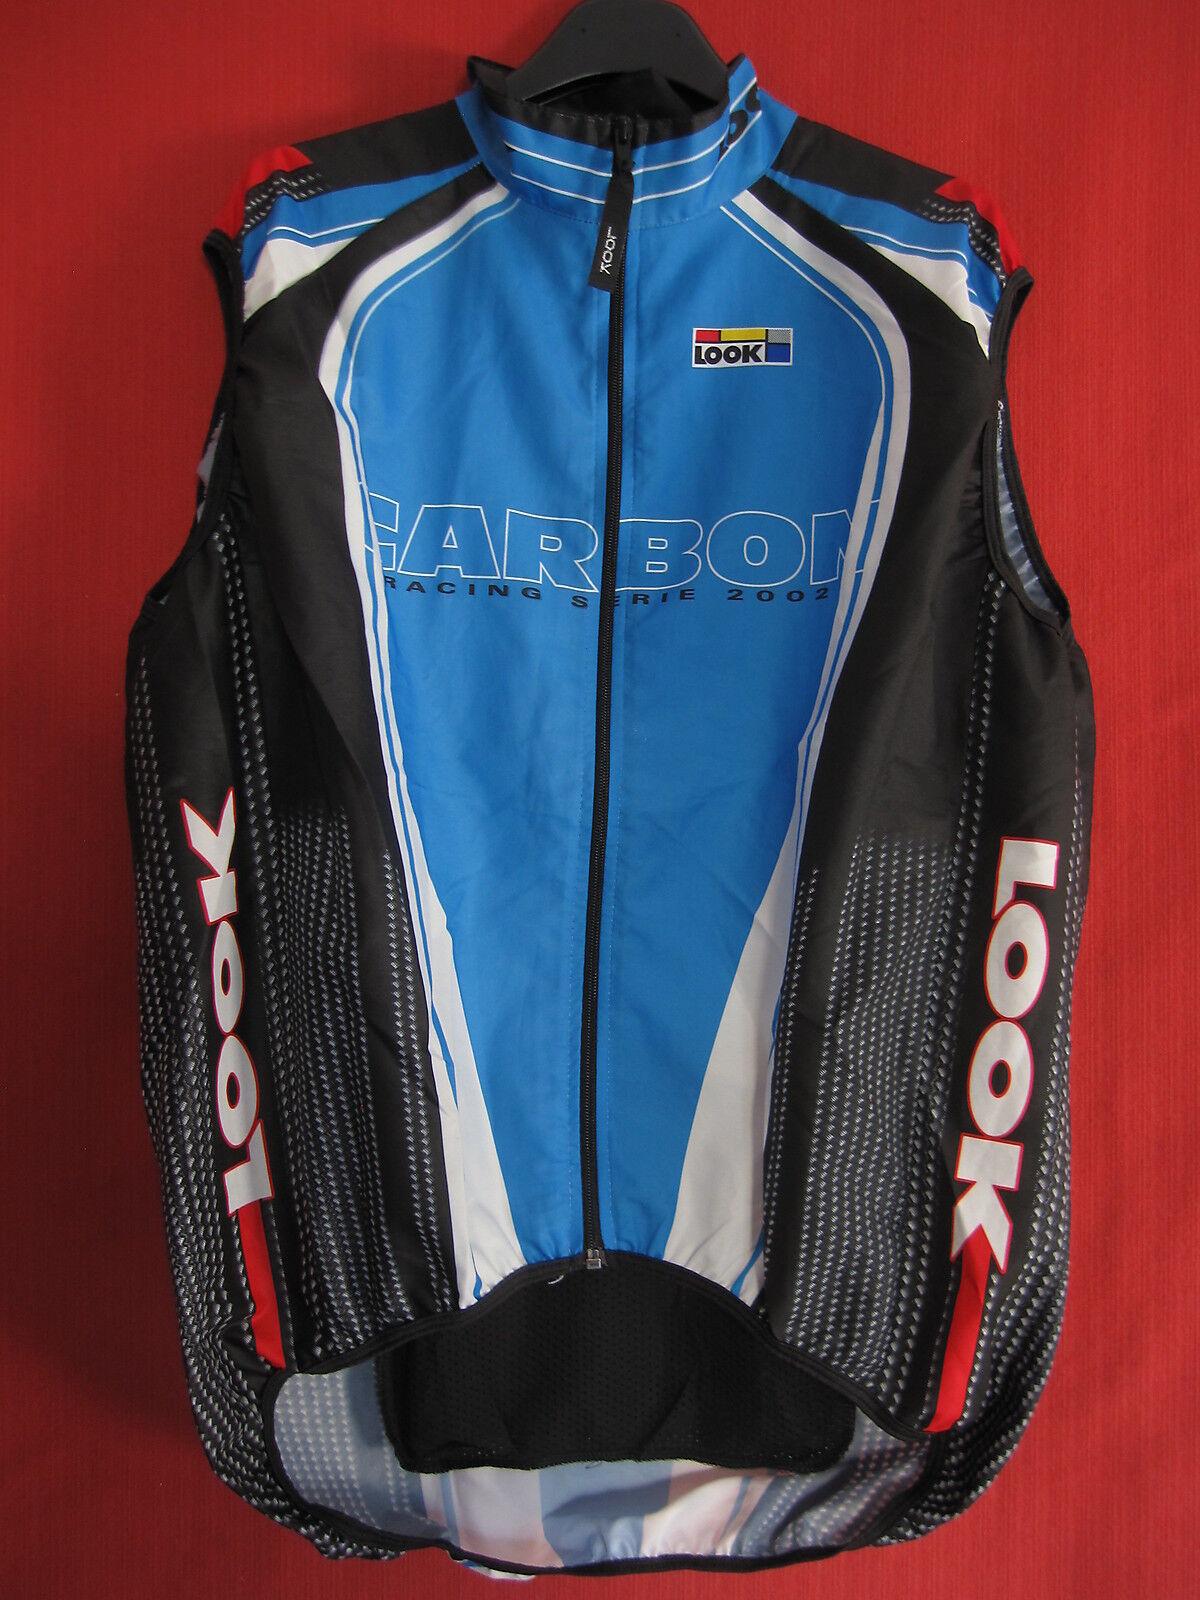 Maillot cycliste LOOK Carbon Racing 2002 sans manche coupe vent Jersey - 4   L